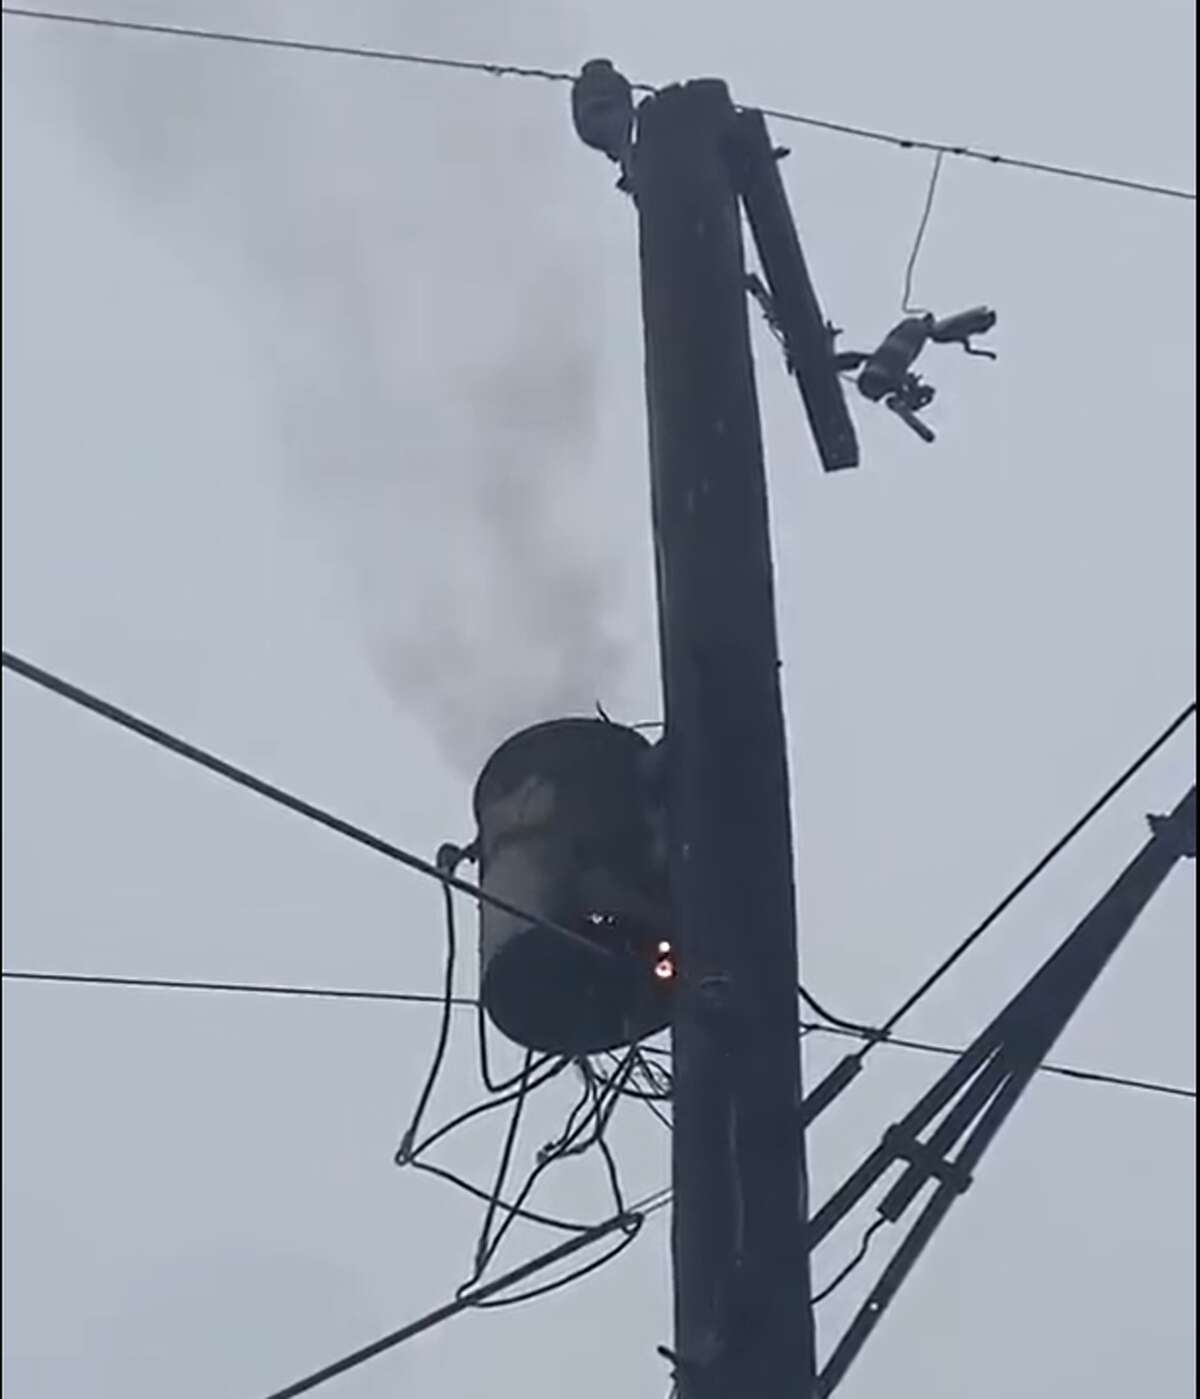 Lightening struck this unit near Thomas Jefferson High School.